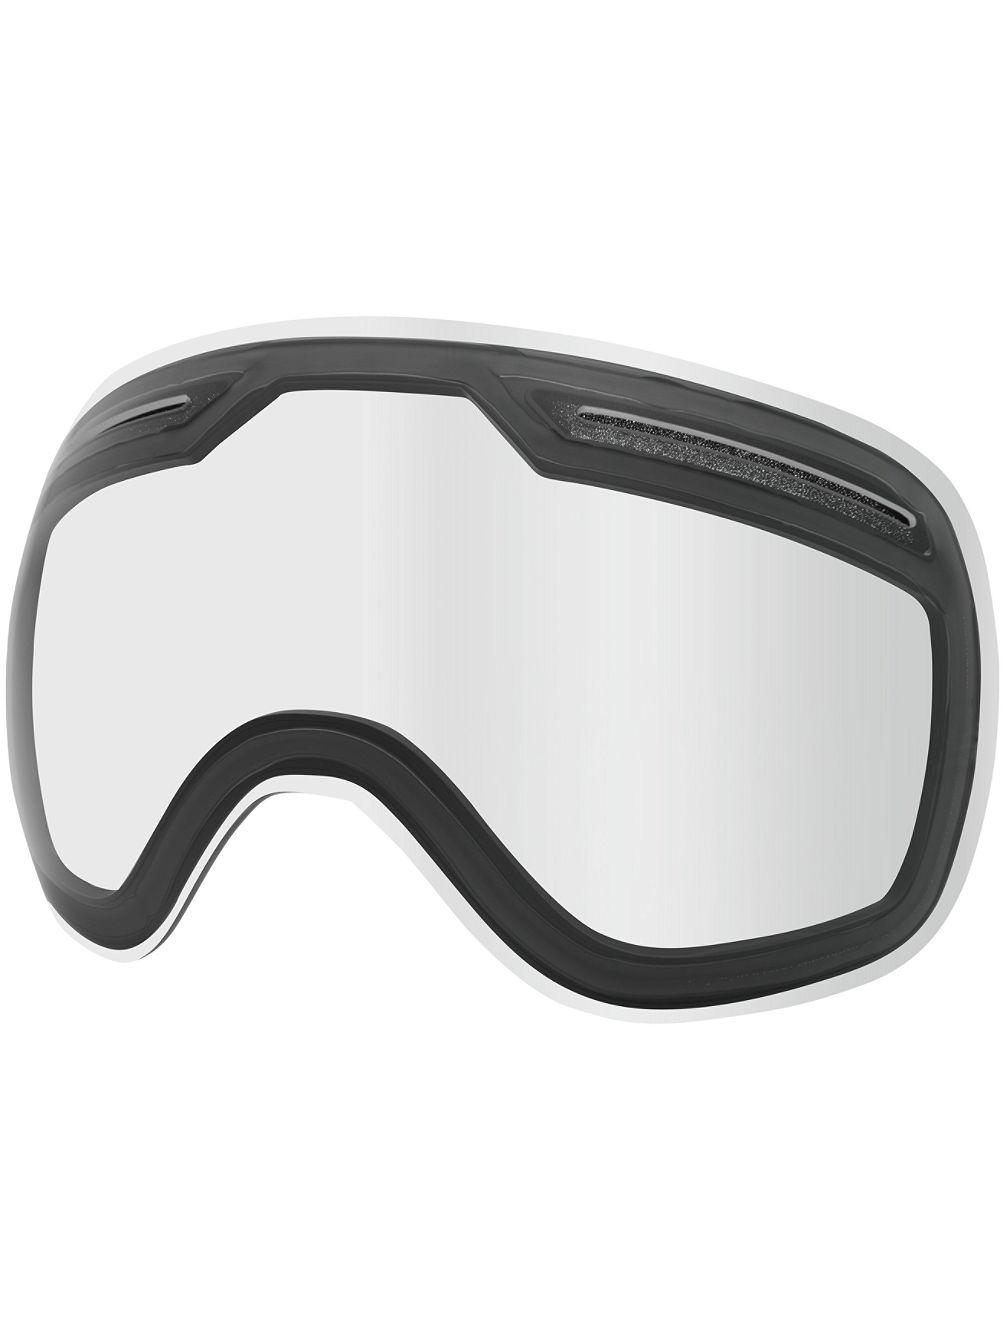 5d89051d063 Buy Dragon X1 Base Replacement Lens online at blue-tomato.com